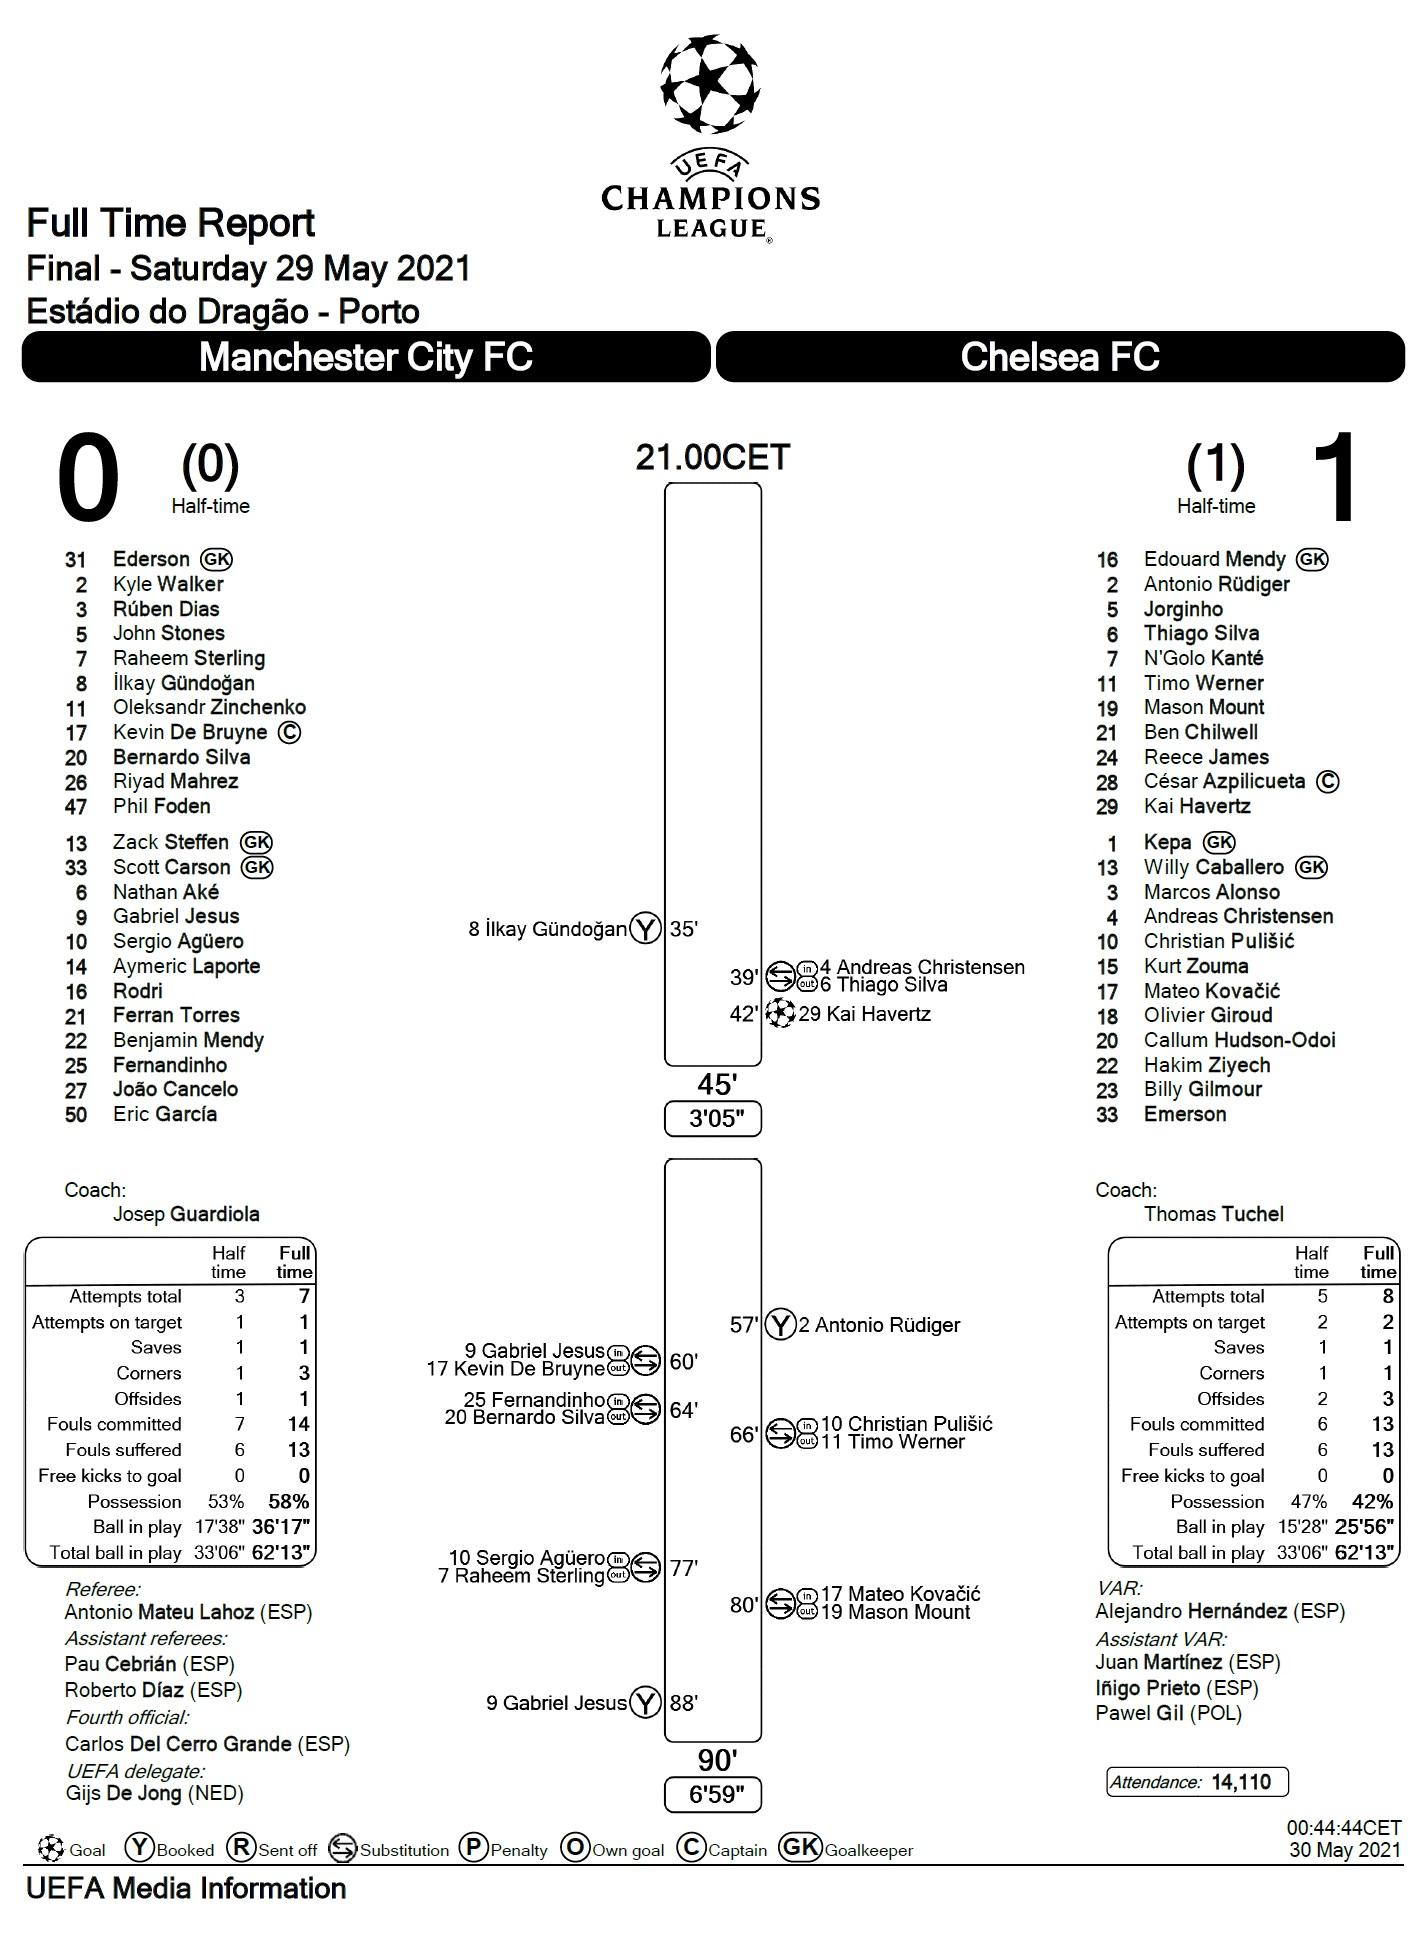 Манчестер Сити (Англия) - Челси (Англия) 0:1